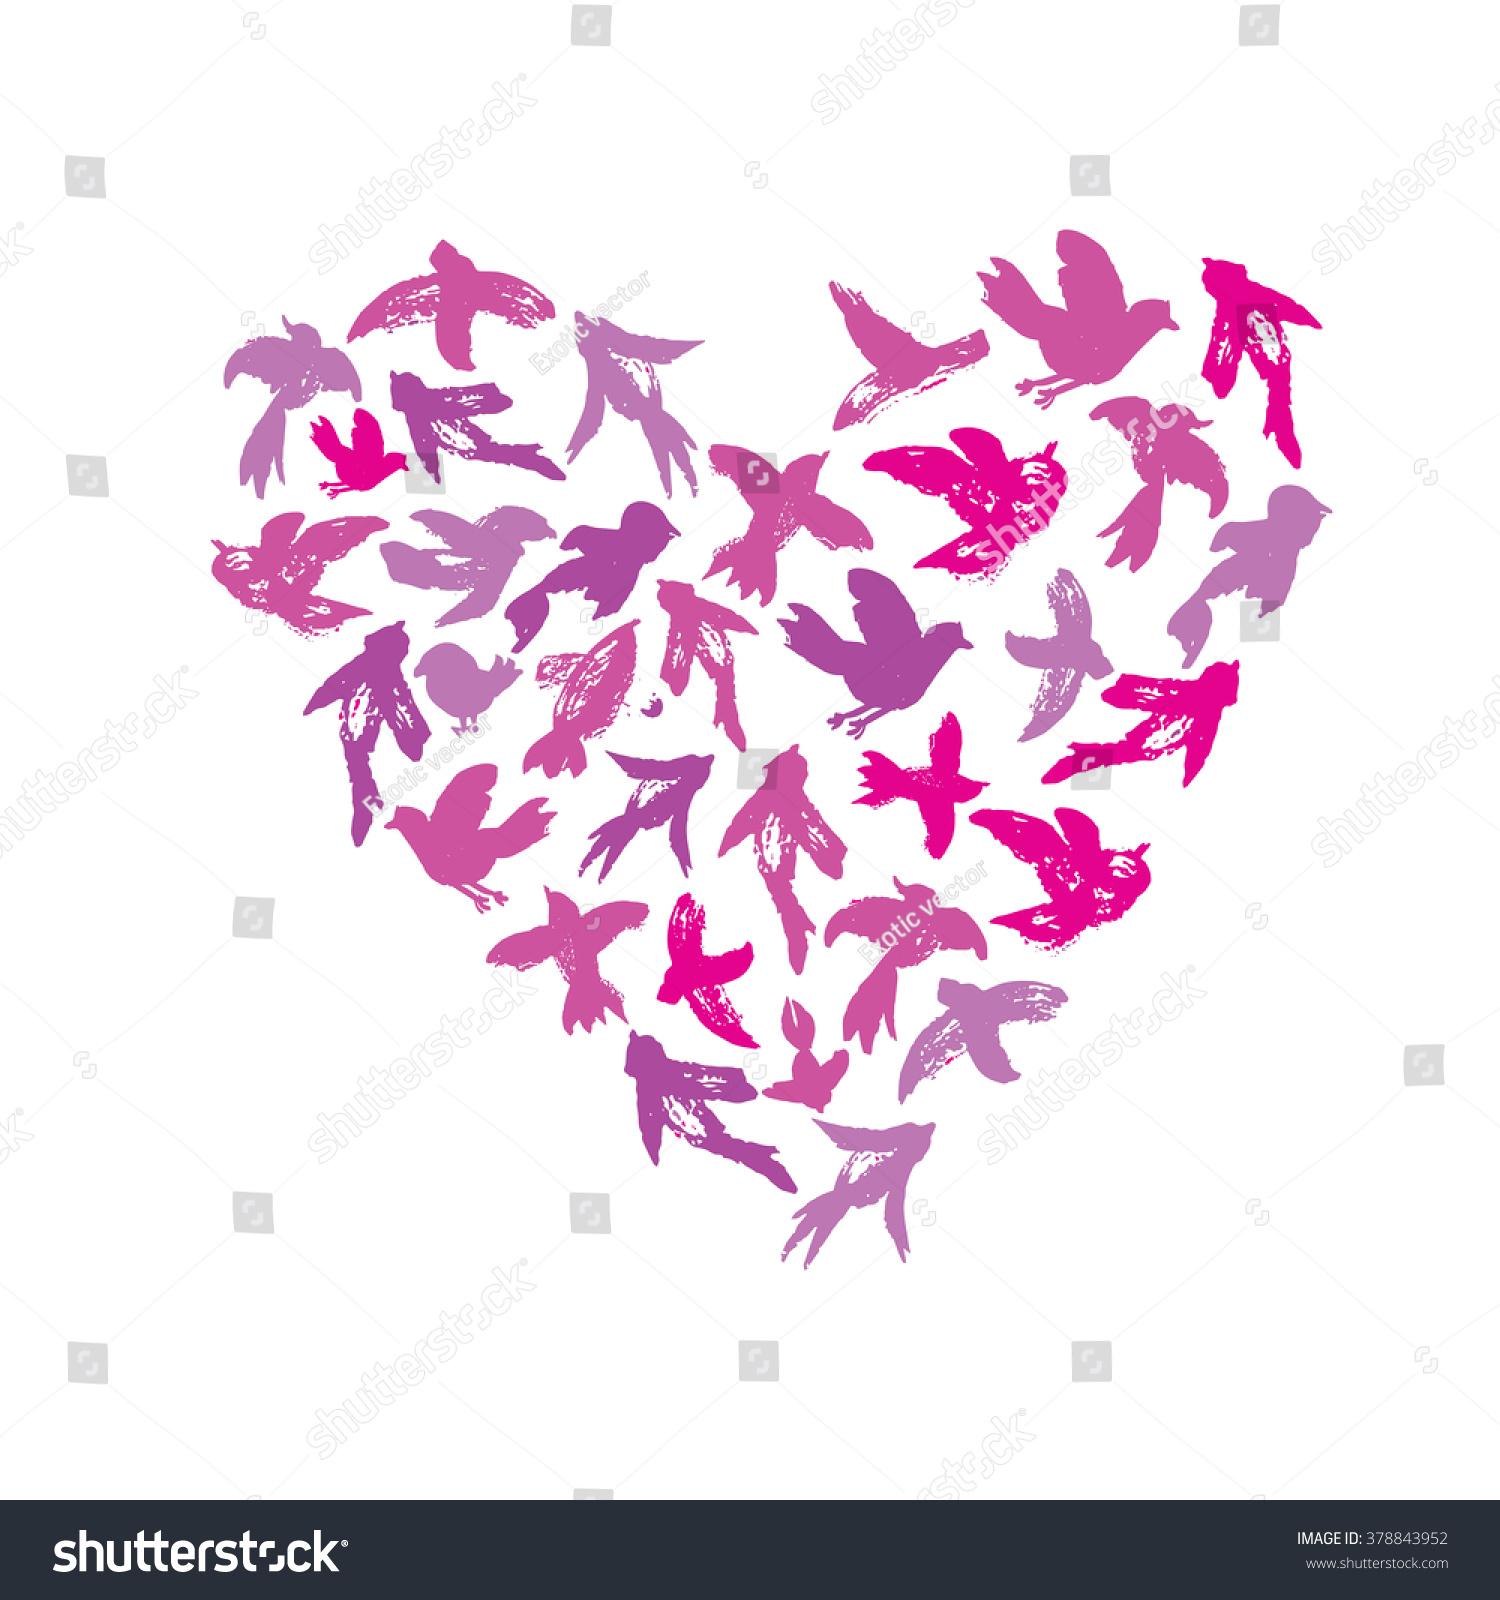 Vector Watercolor Heart Birds Silhouettes Flying Stock Vector (2018 ...